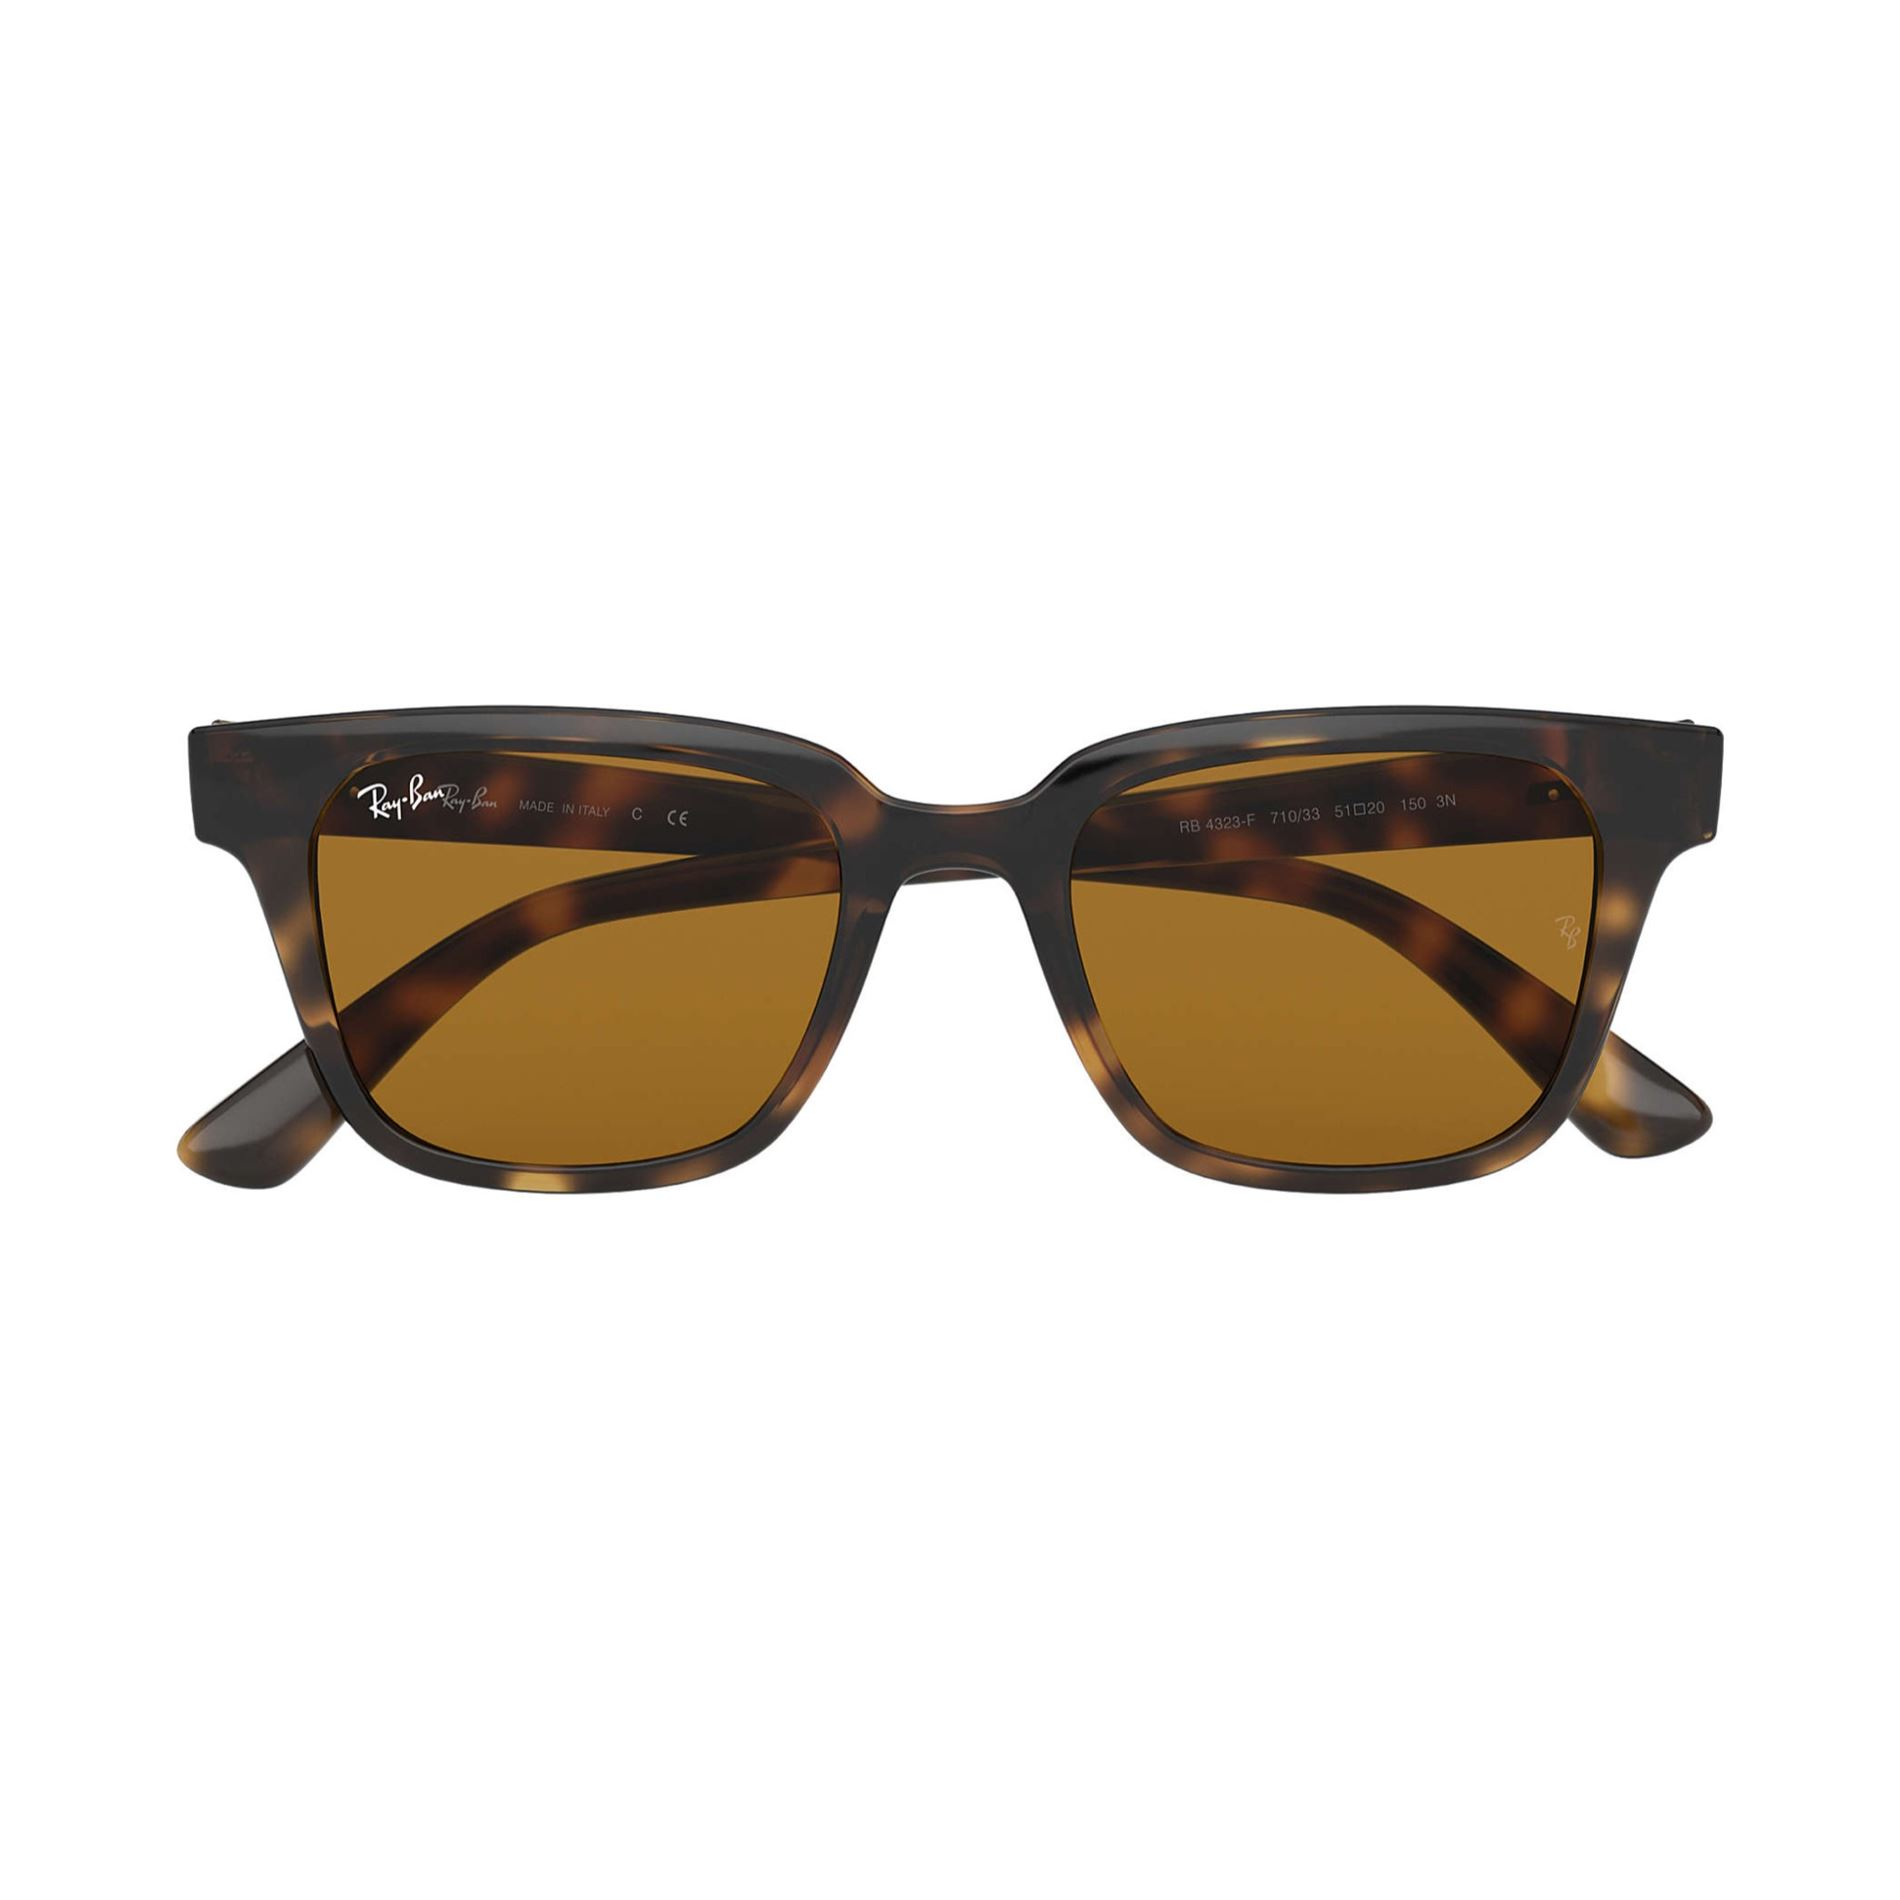 Ray Ban太陽 眼鏡 RB4323VF-710/33512